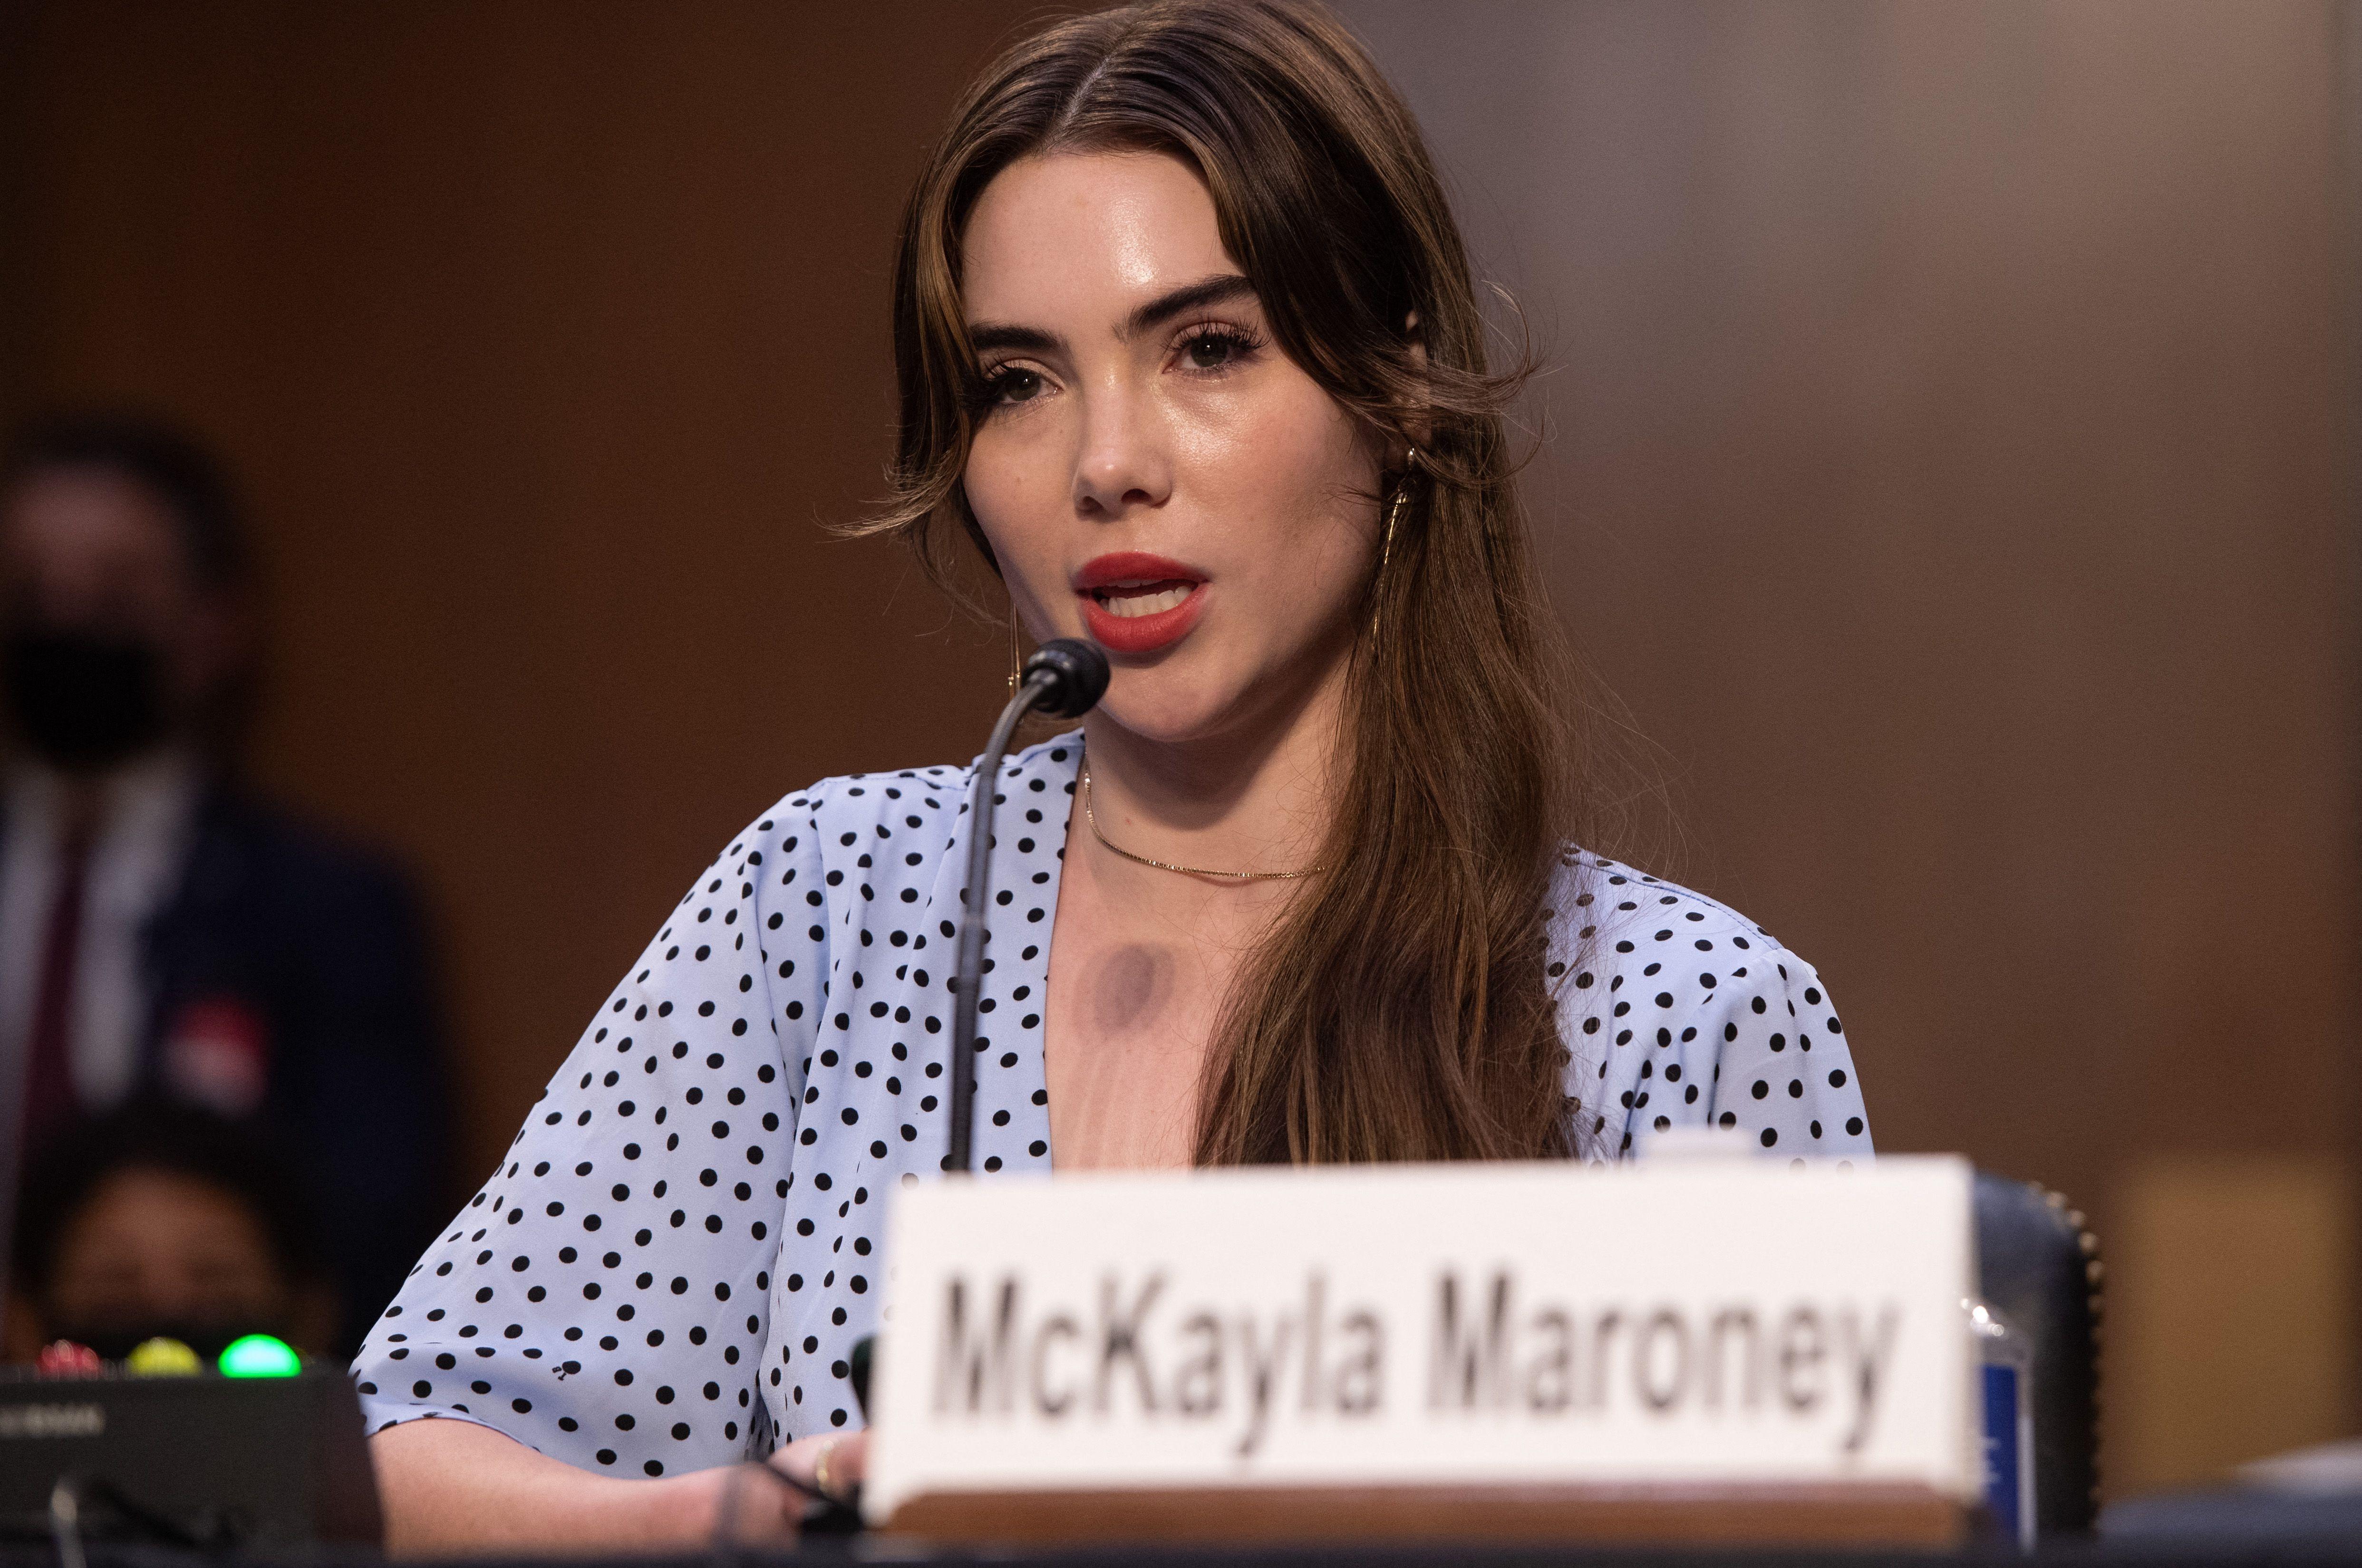 McKayla Maroney testifies during a Senate Judiciary hearing